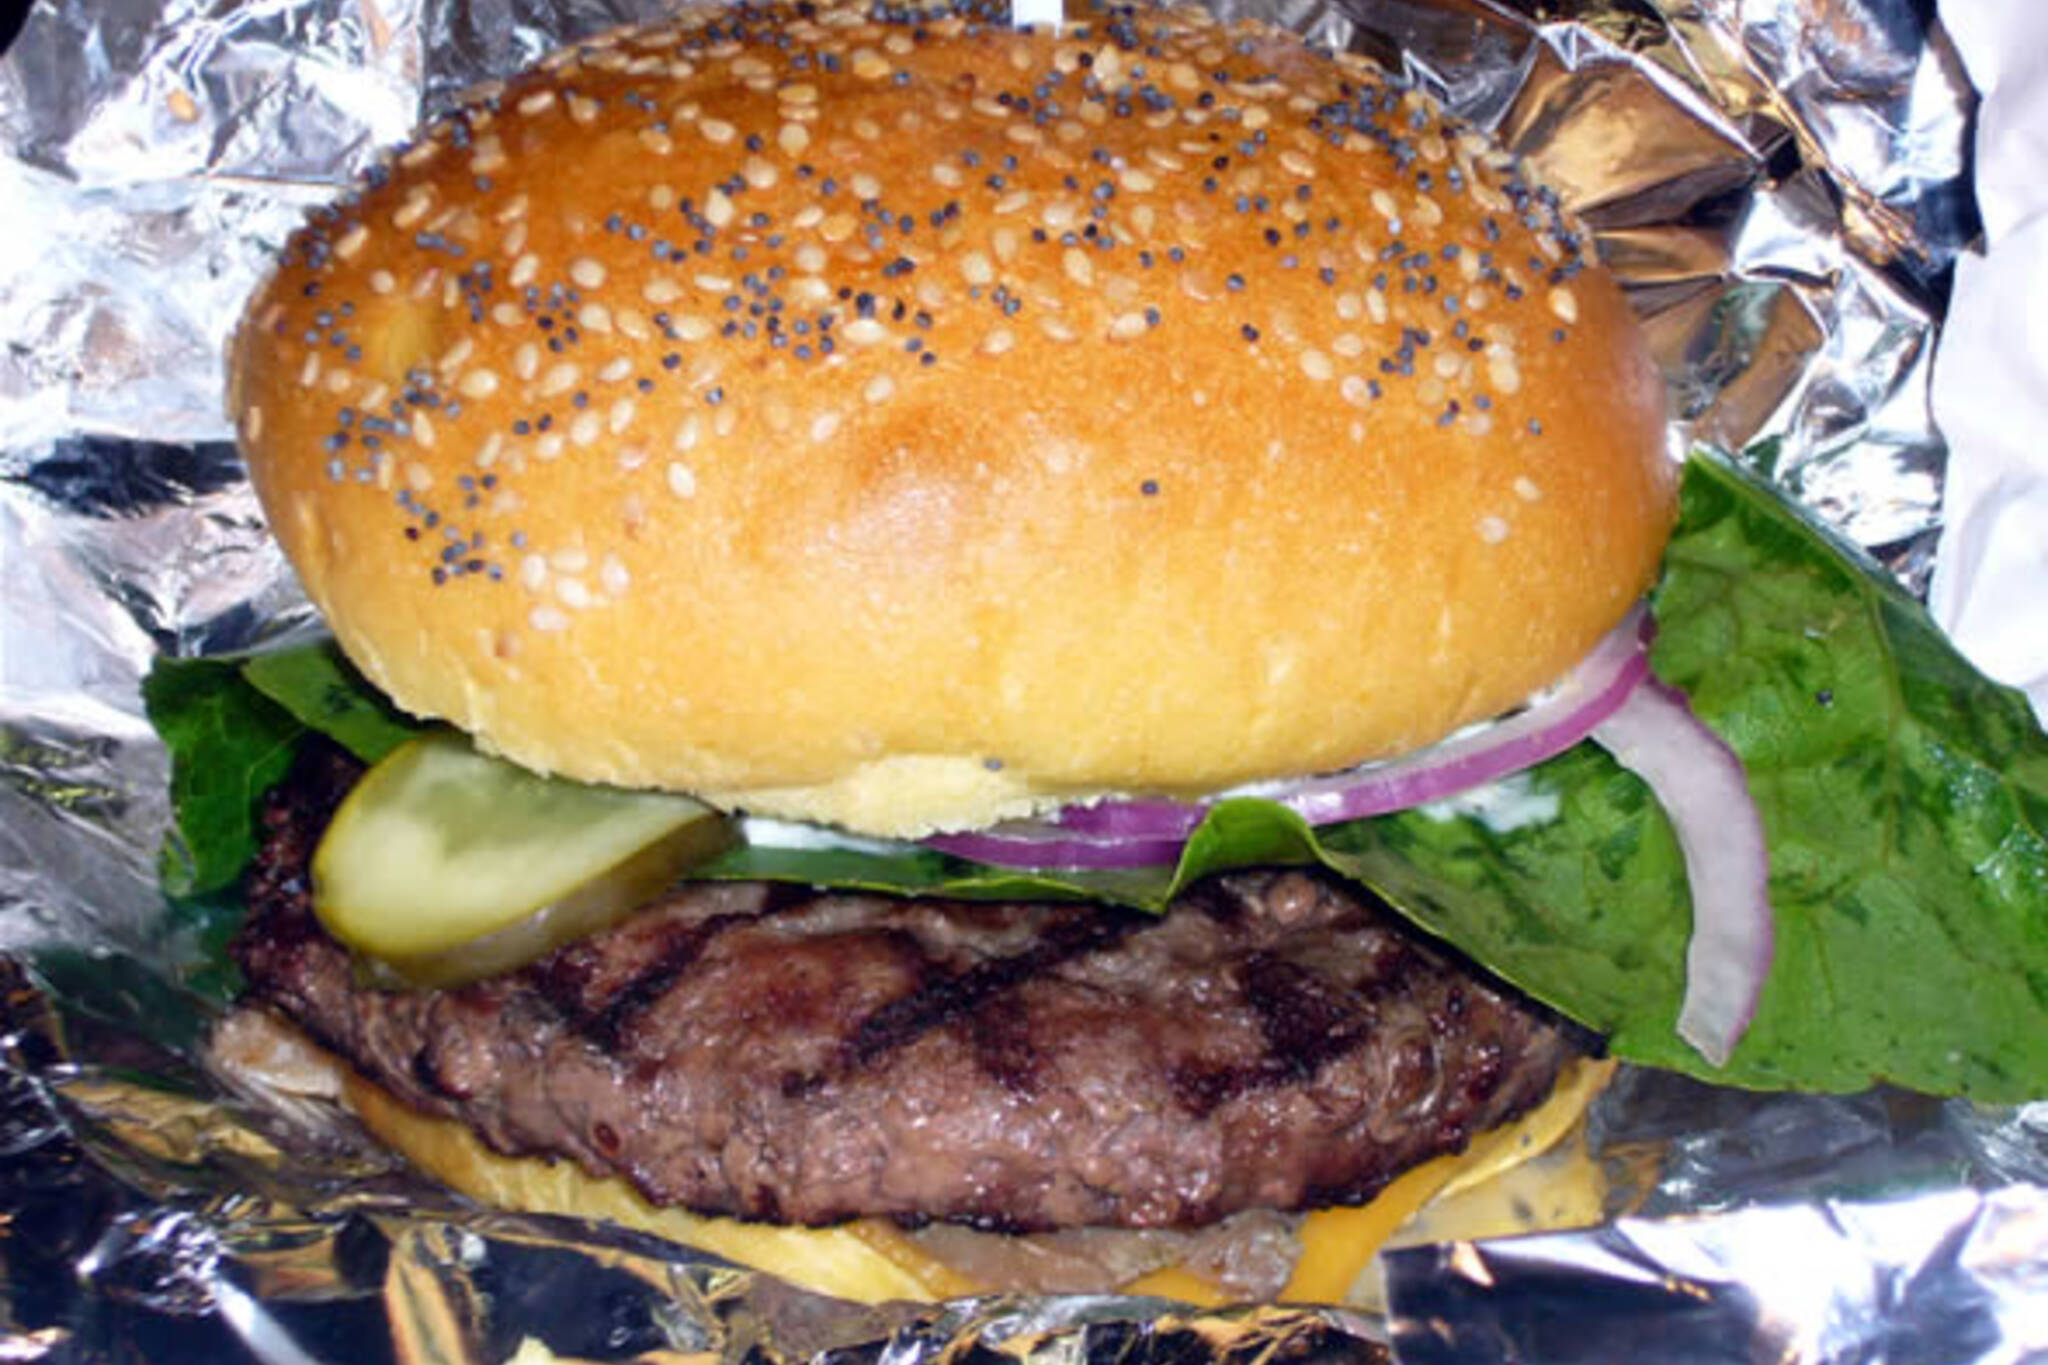 acme burger